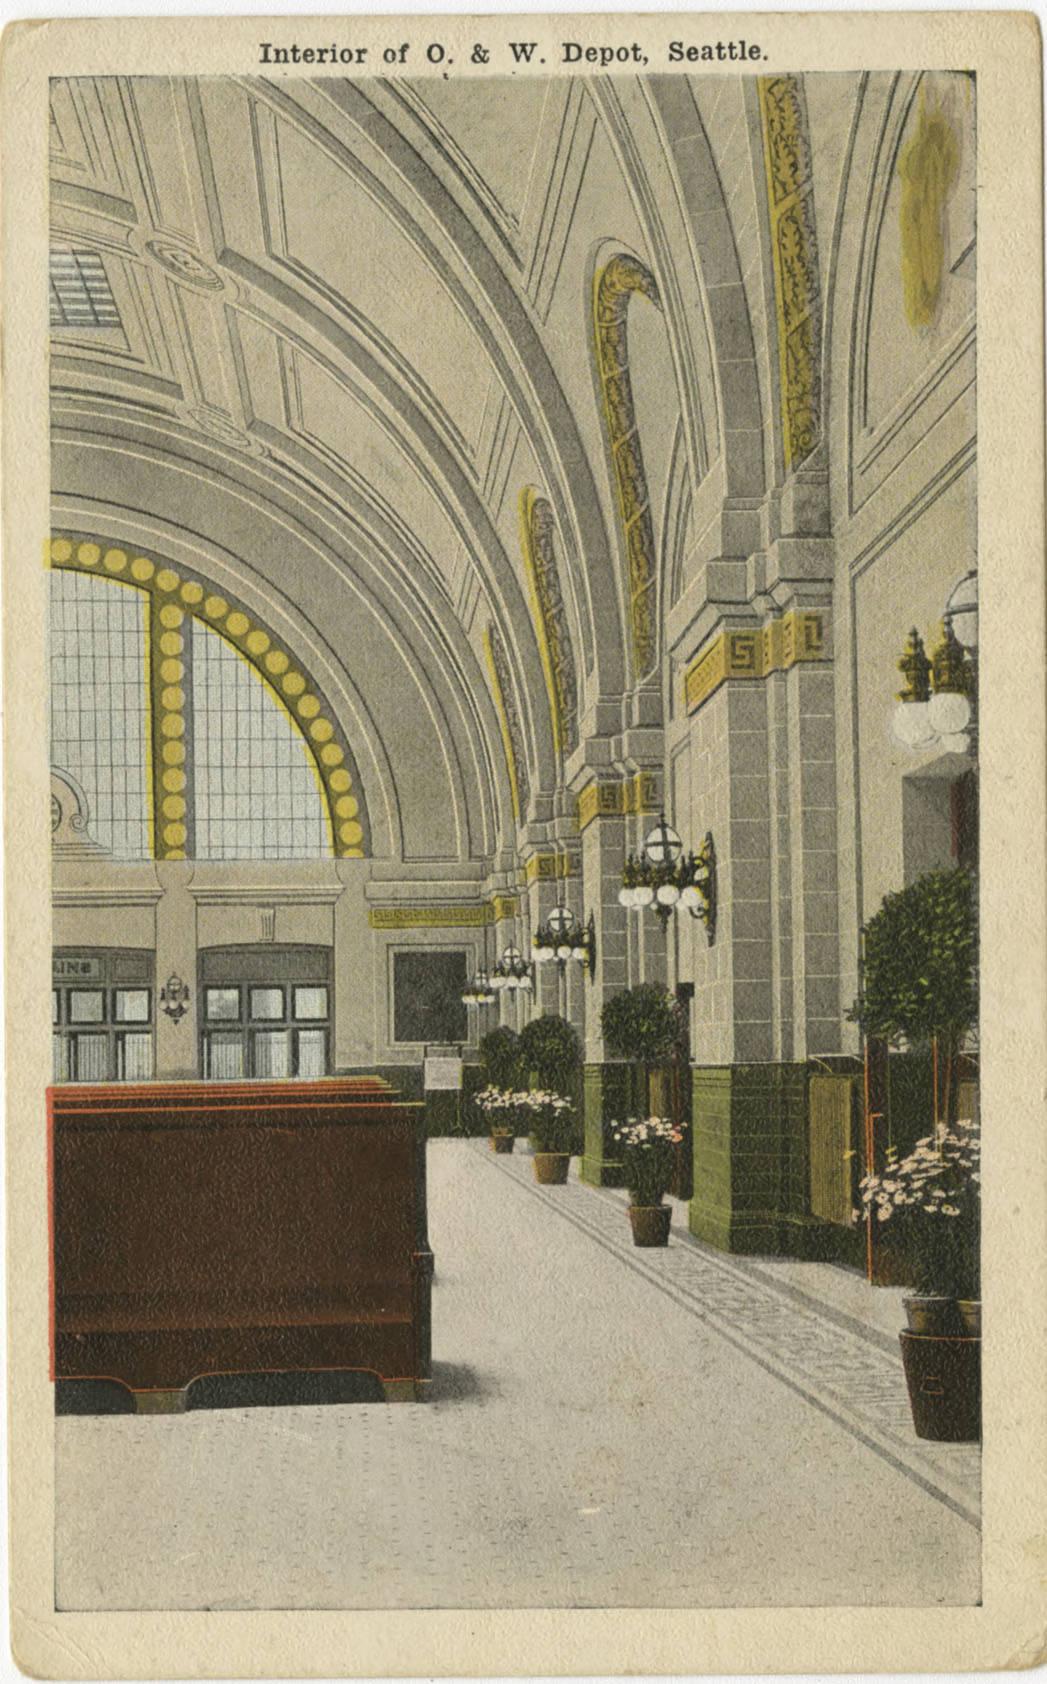 Union Station interior, ca. 1915